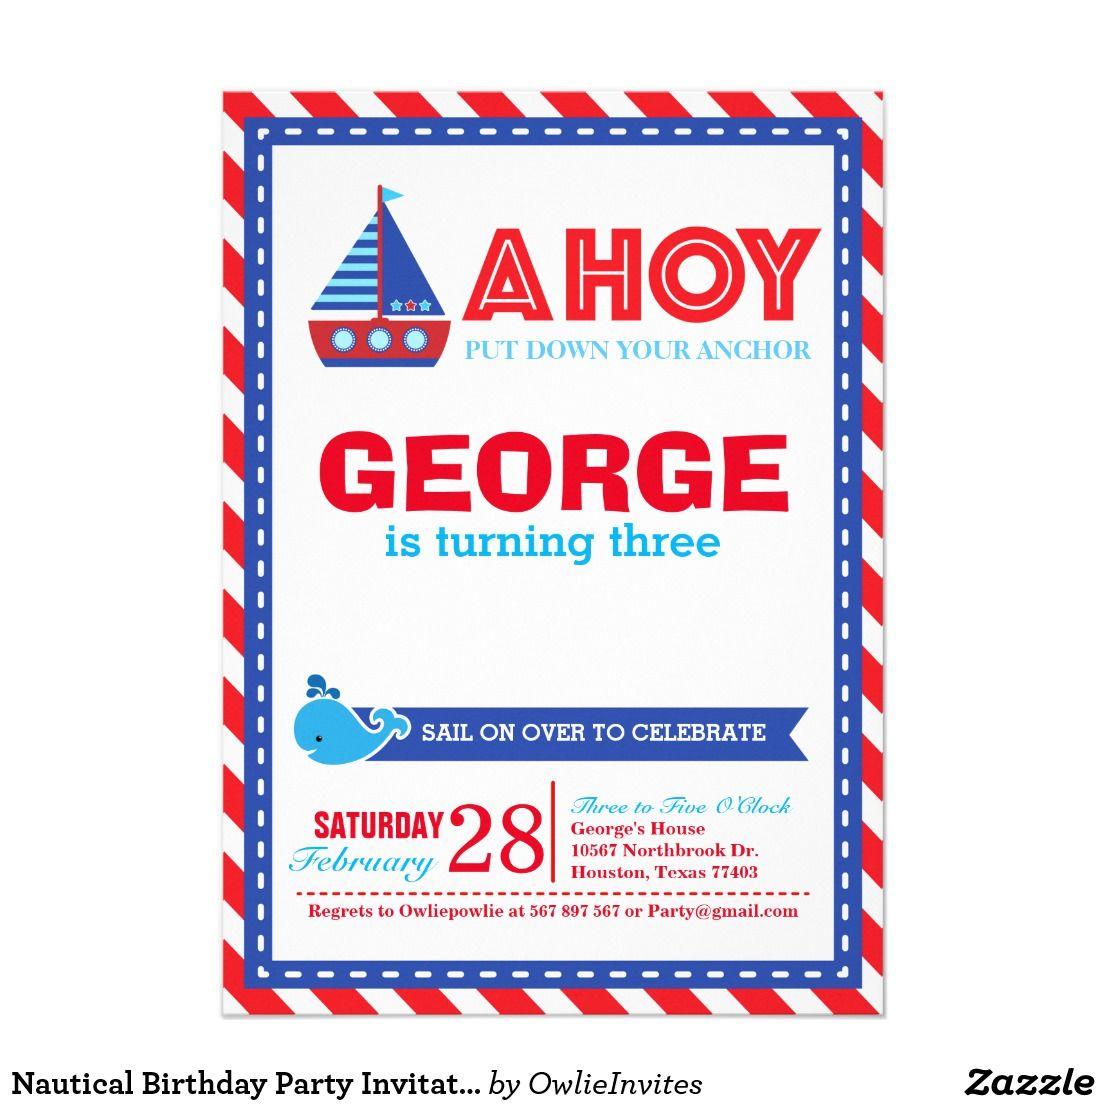 Nautical Birthday Party Invitation | Nautical party, Party ...